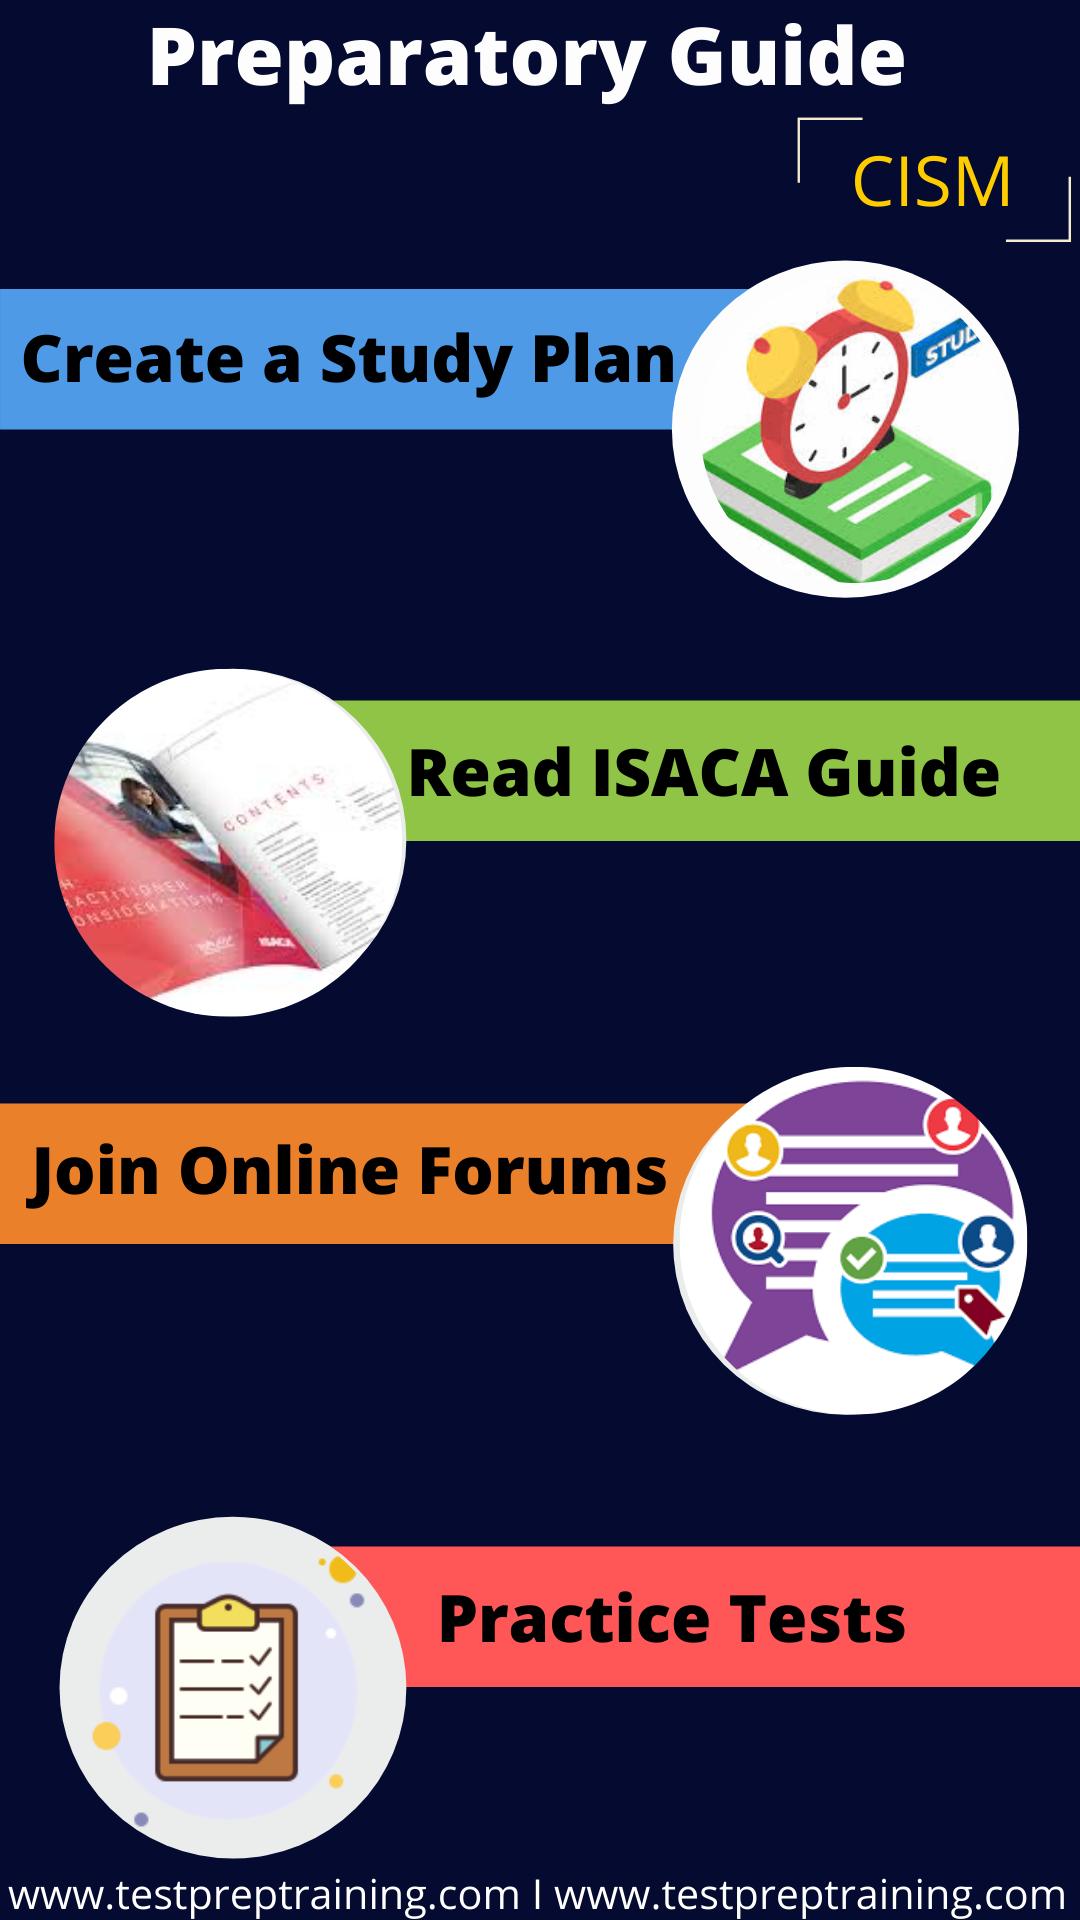 Preparatory Guide for CISM